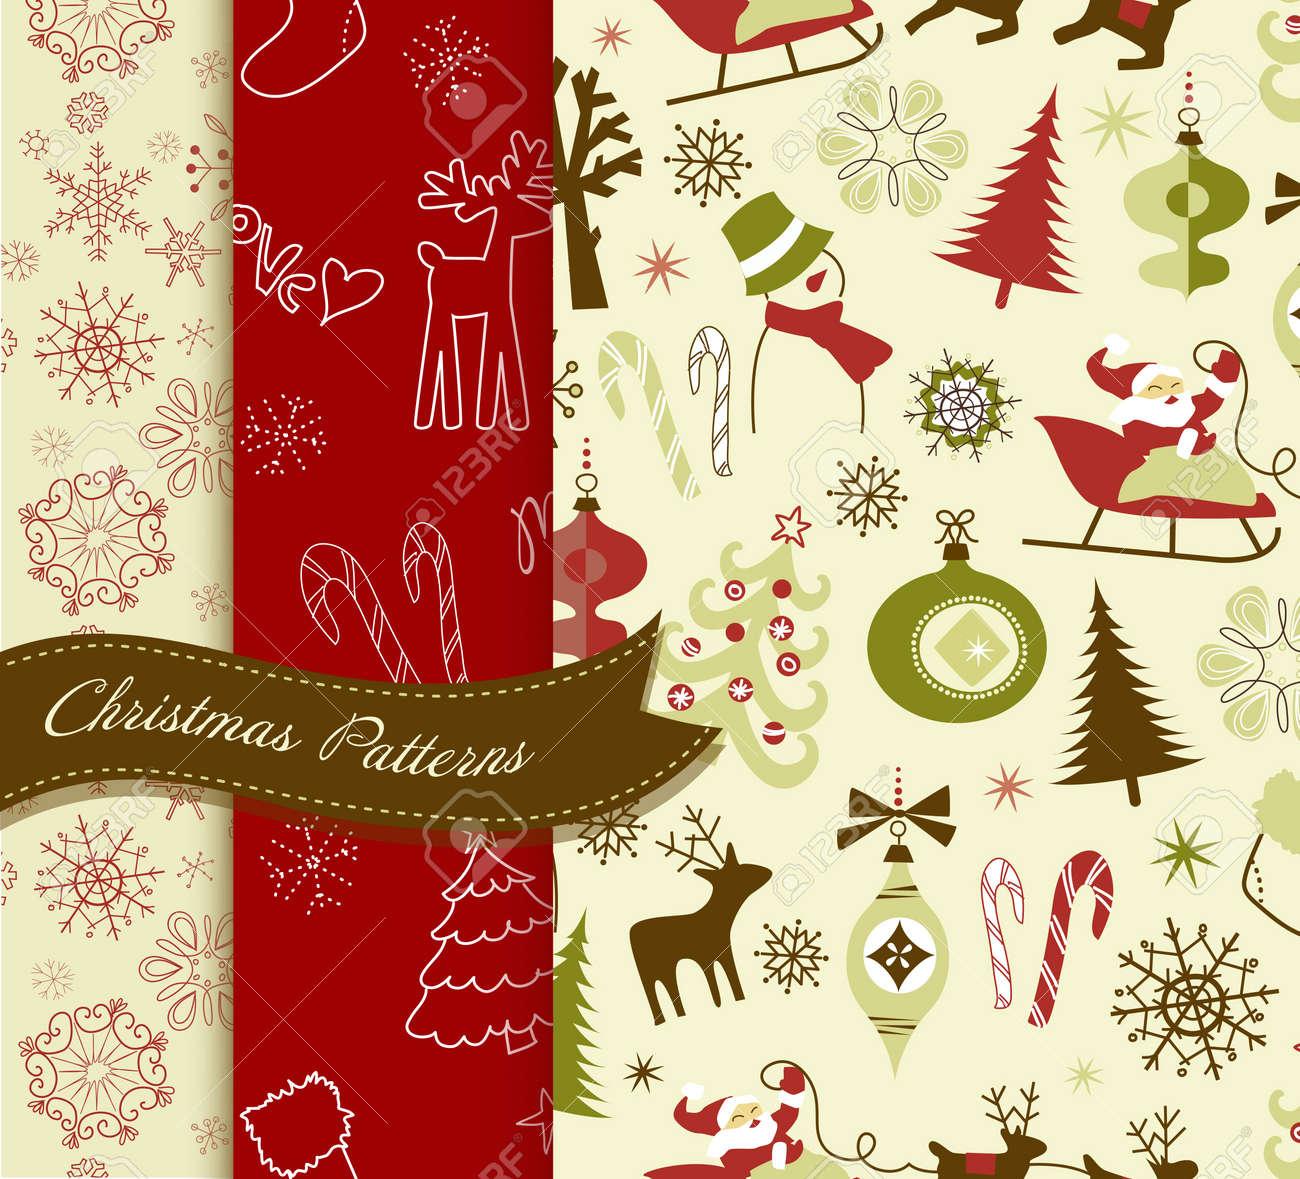 Set of Retro Christmas patterns Stock Vector - 11059359